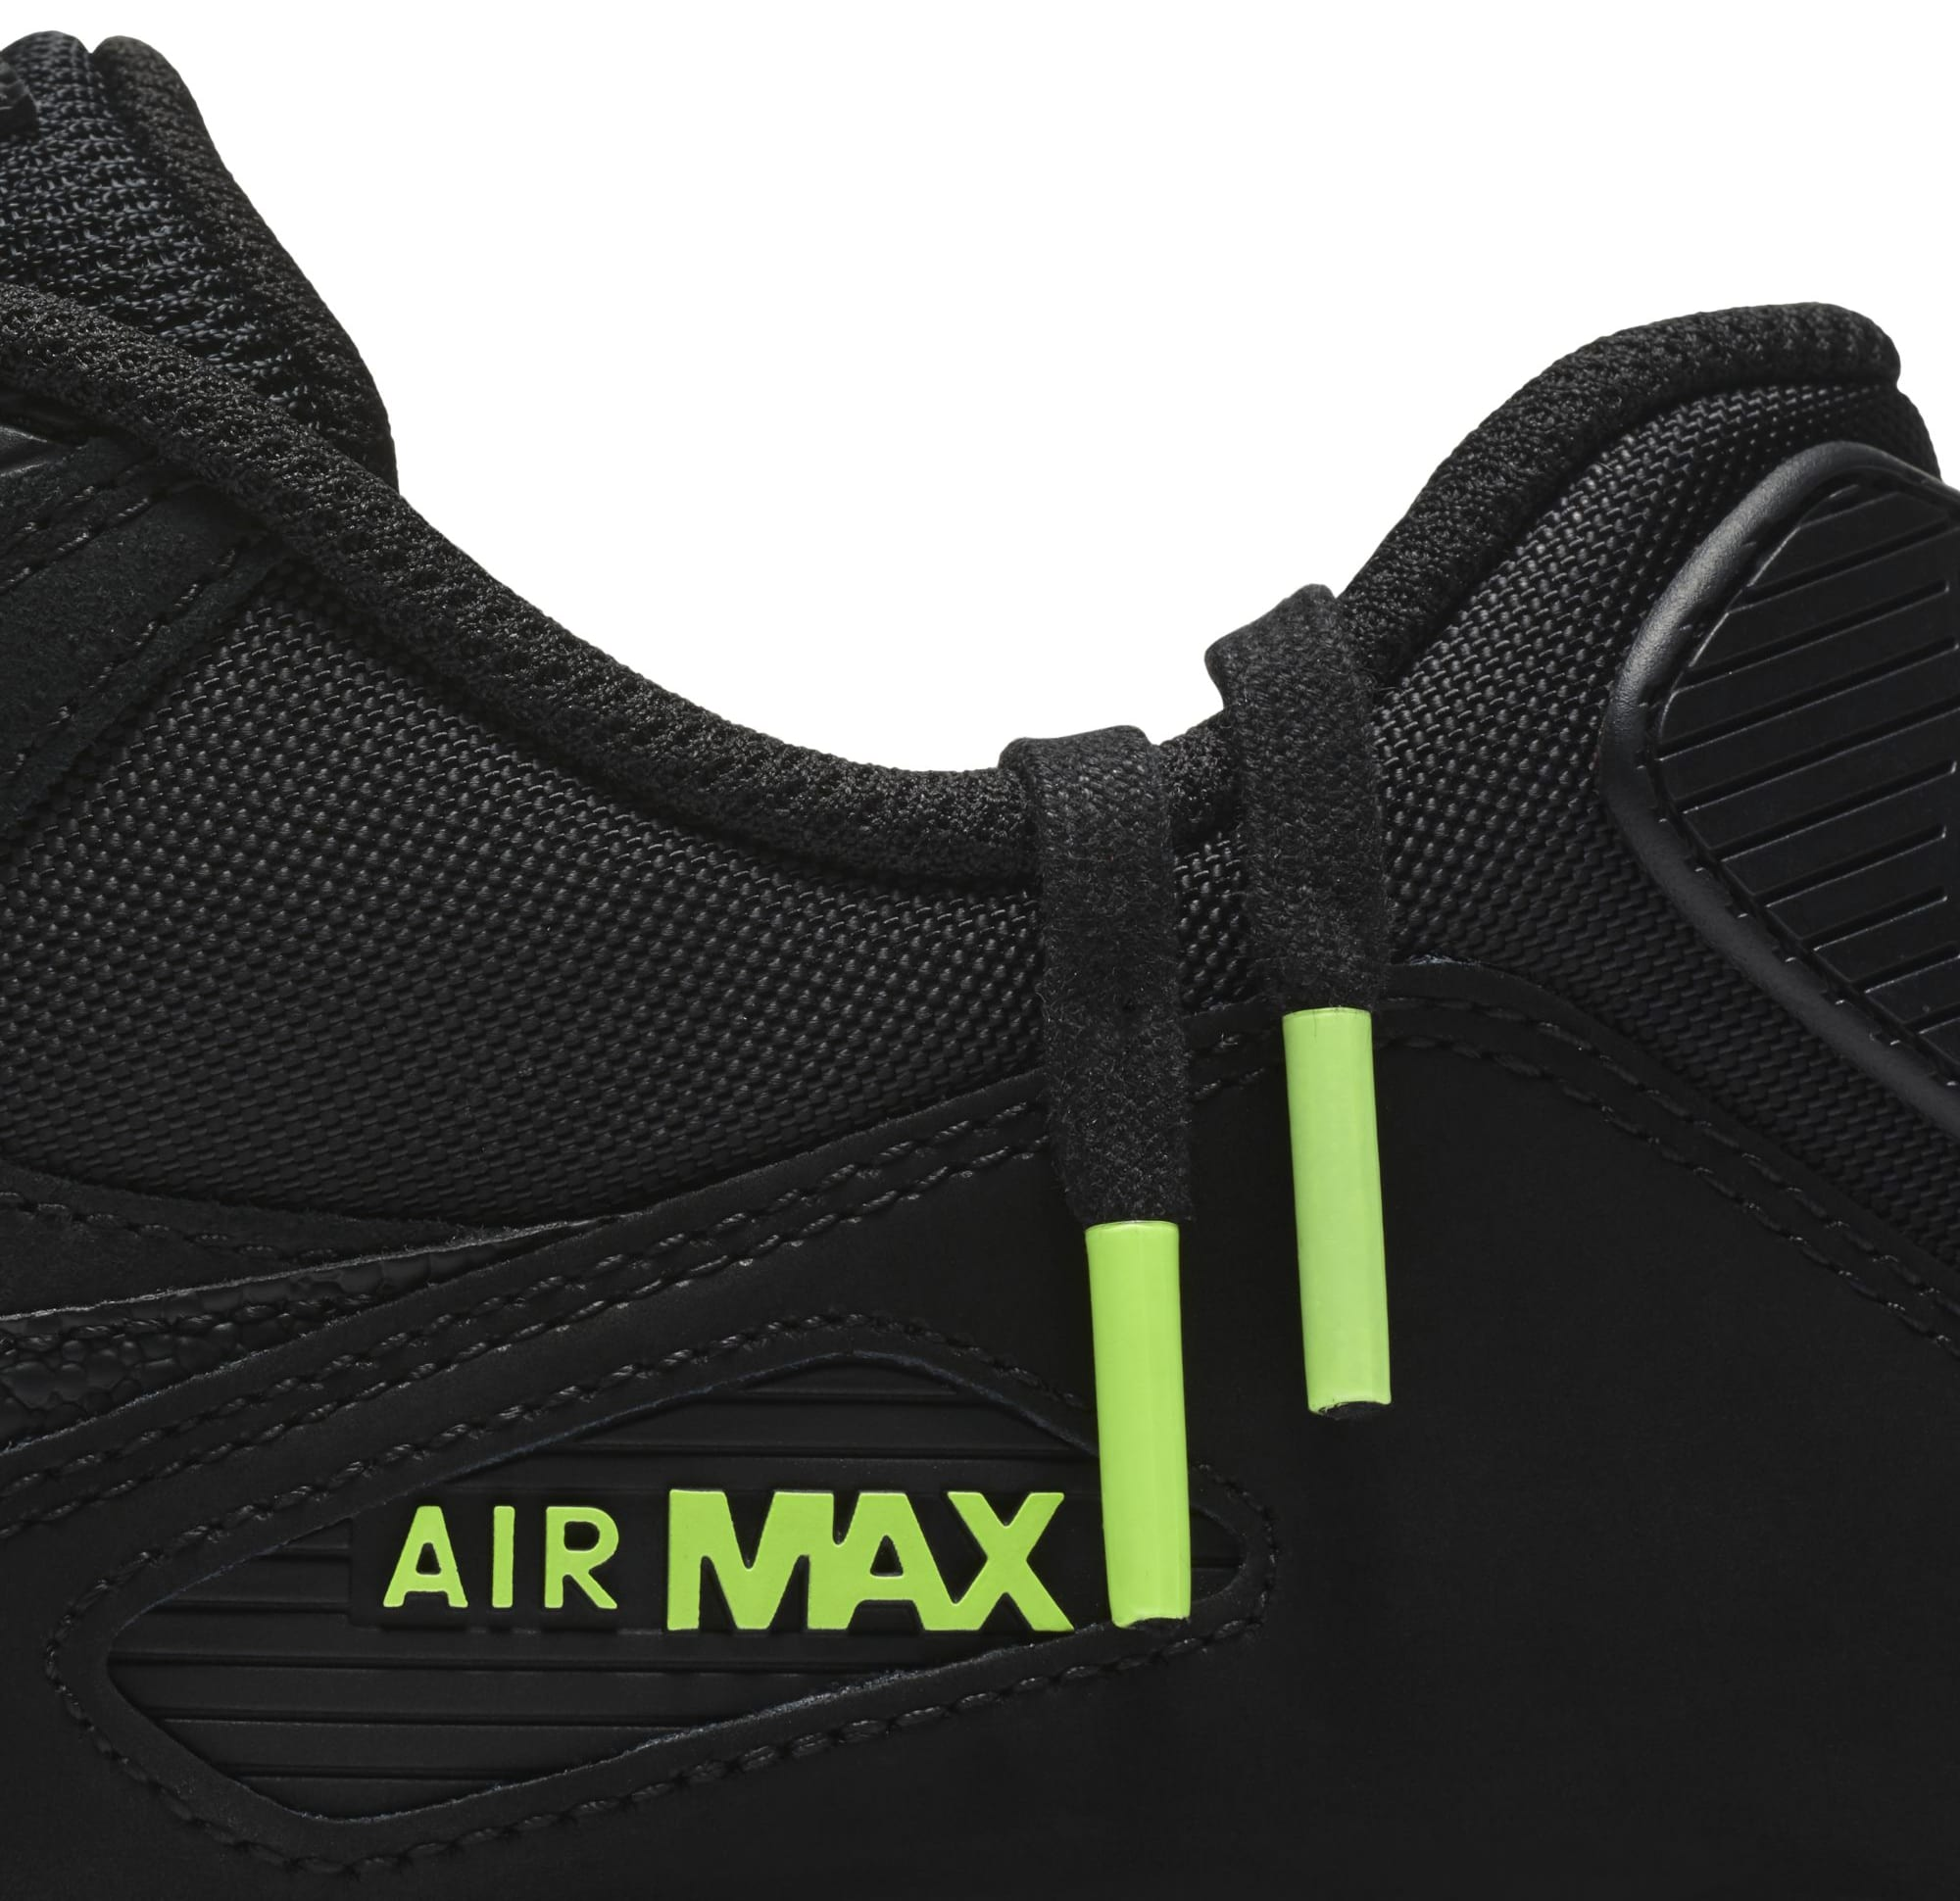 new styles 352ee 1e9fb Nike Air Max 90 Black/Black-Volt AQ6101-001 Release Date ...